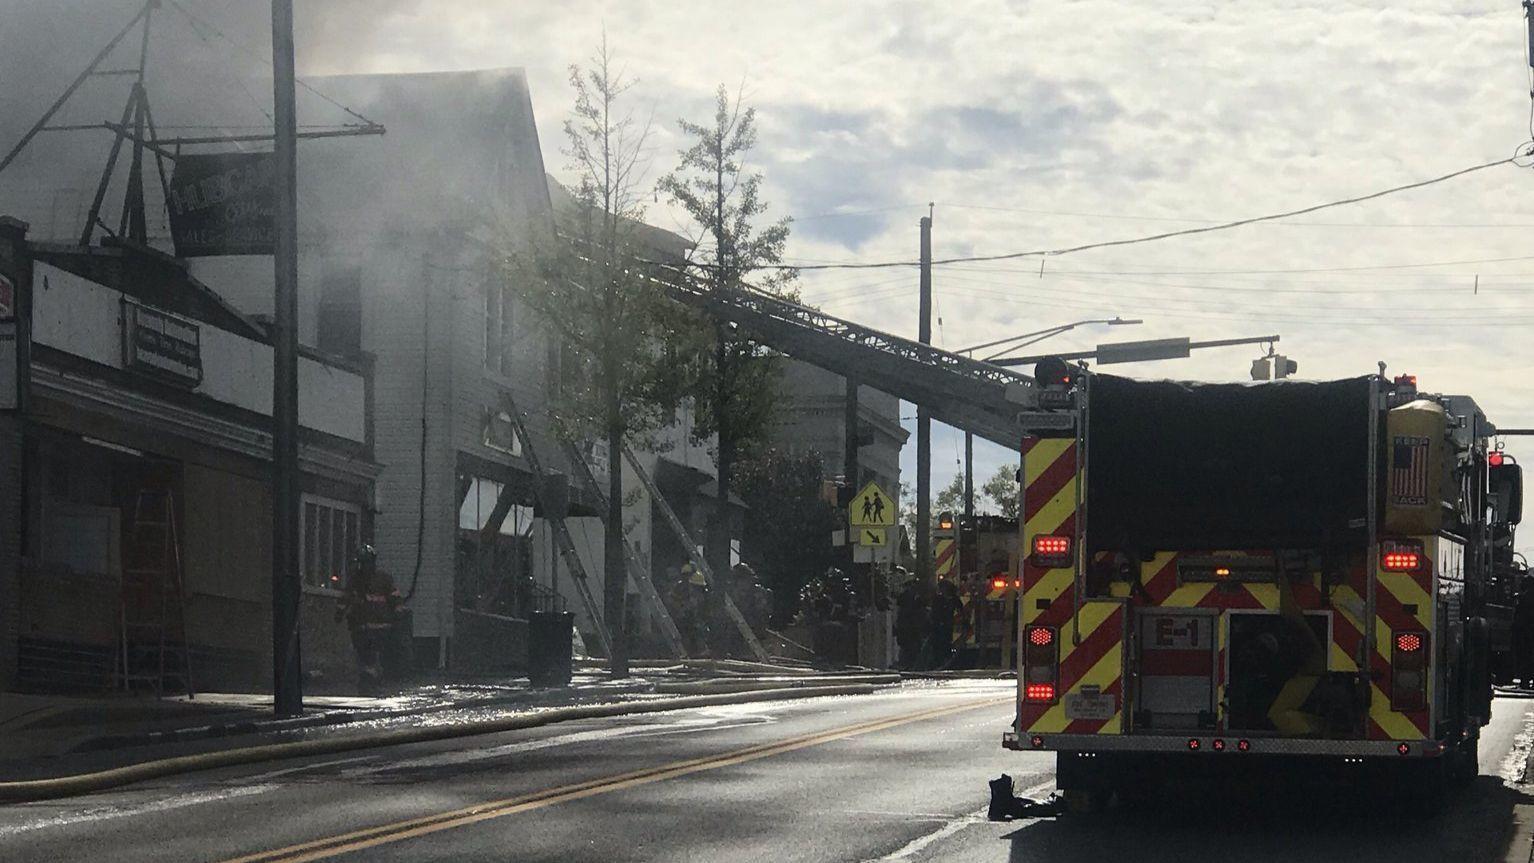 Baltimore County Fire Department battling house fire in Overlea | Baltimore Sun